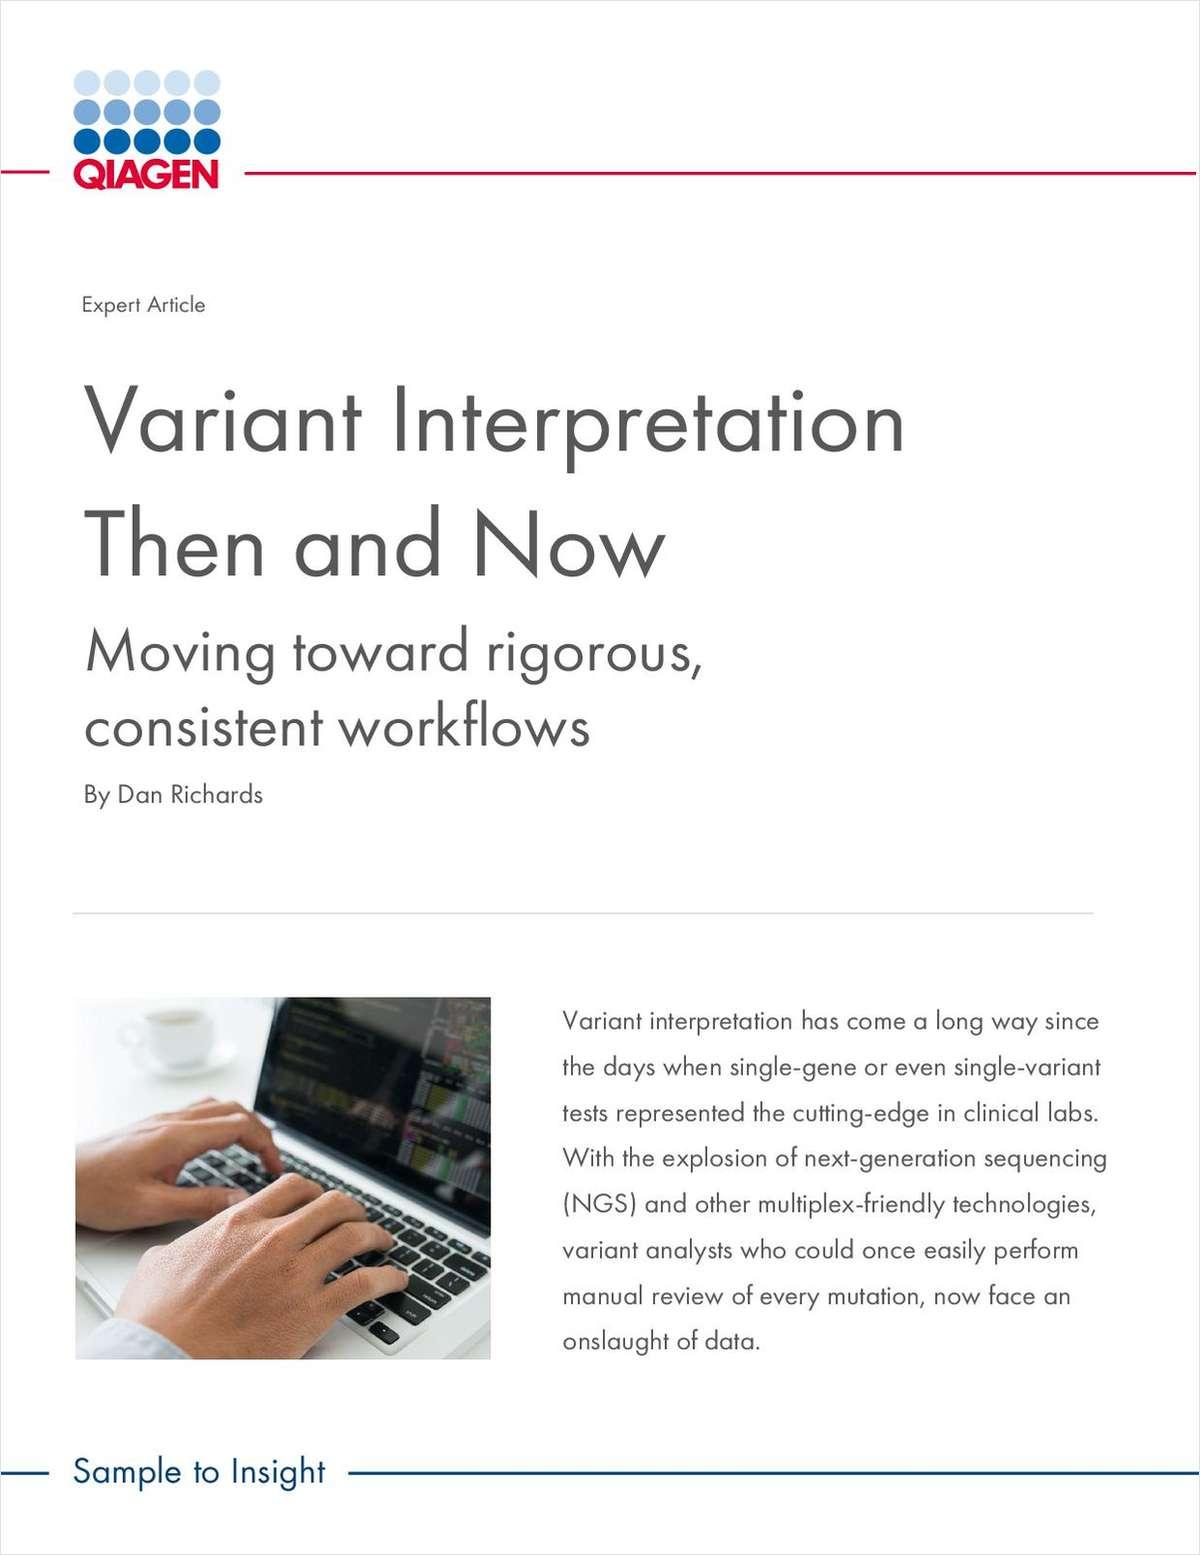 Variant Interpretation Then and Now: Moving Toward Rigorous, Consistent Workflows